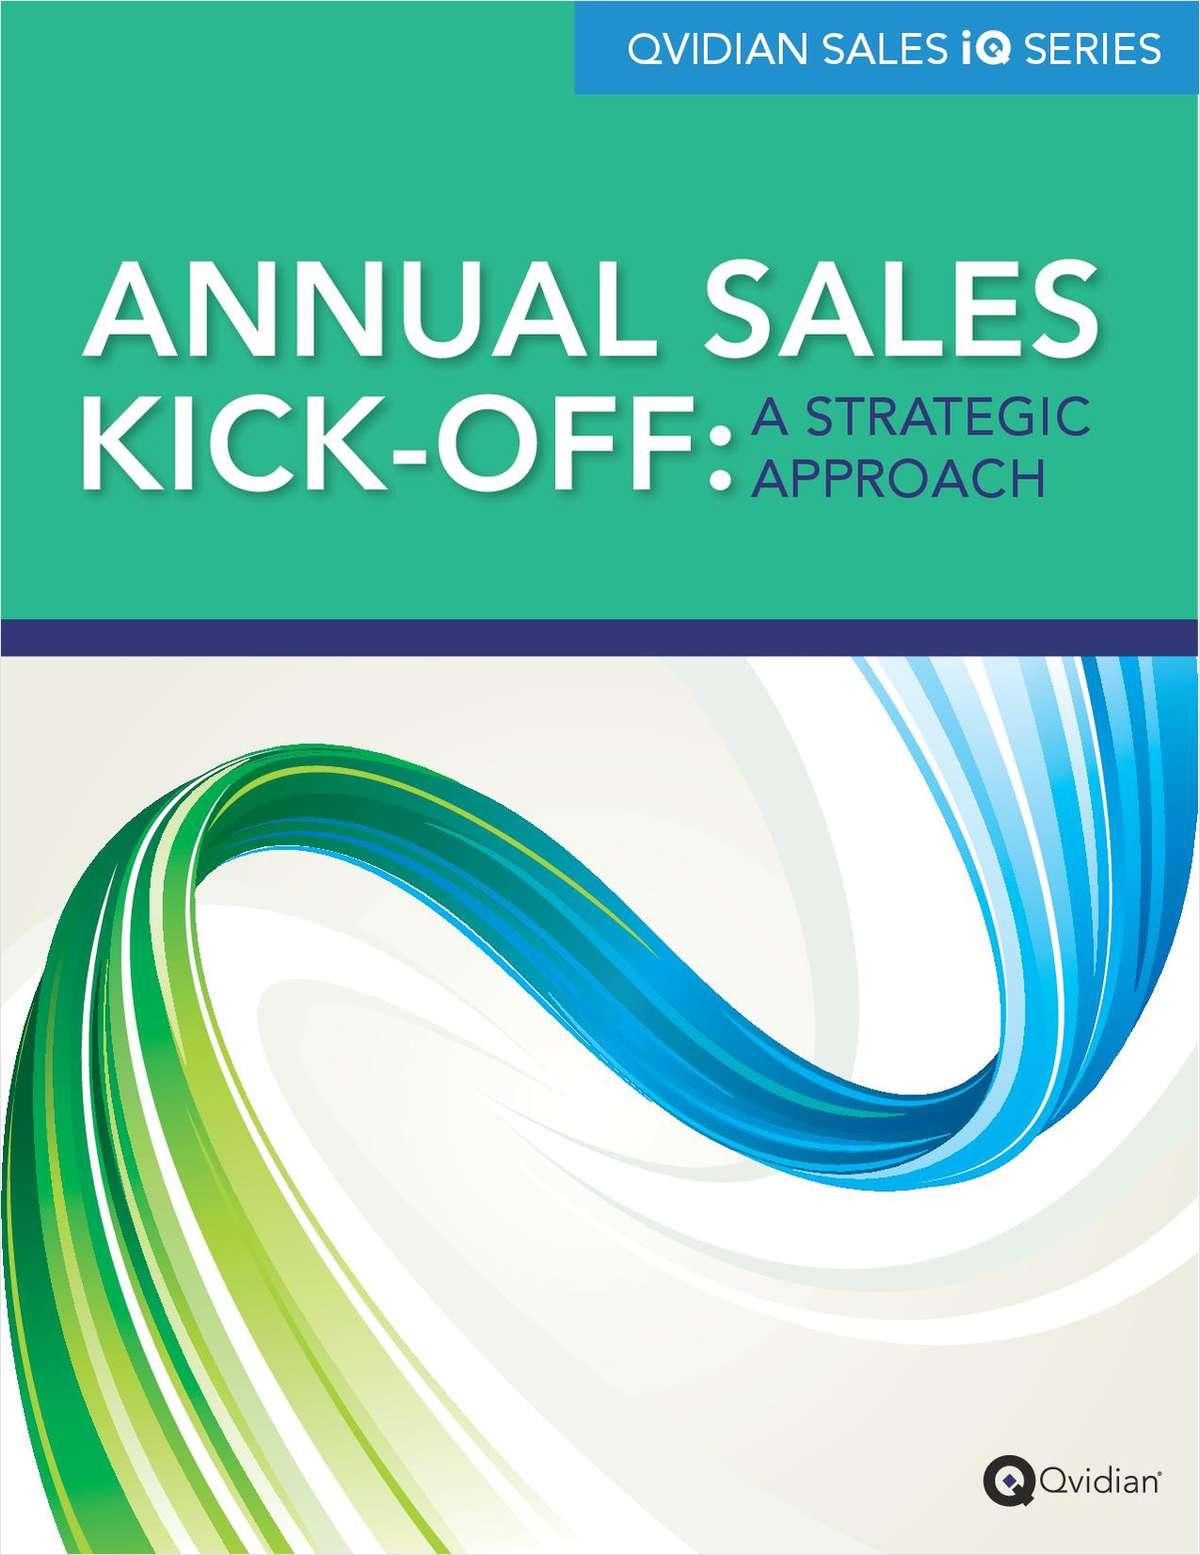 Annual Sales Kick-offs: A Strategic Approach